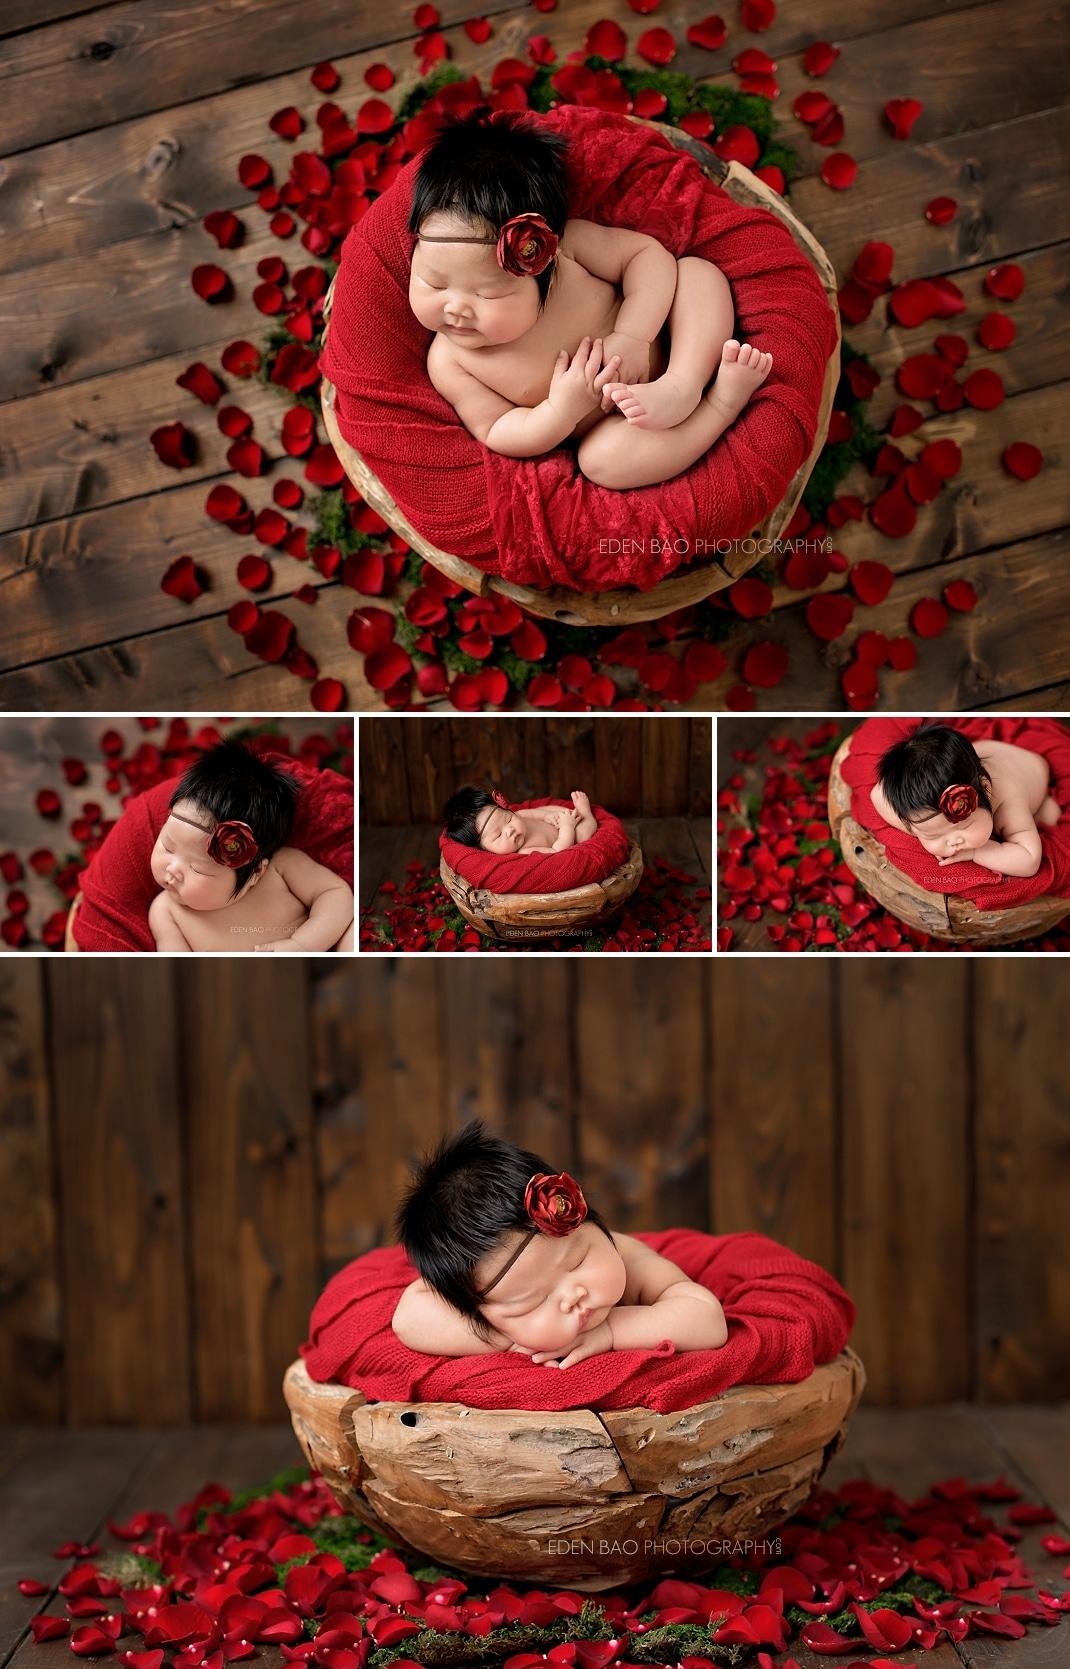 Newborn Photographer Bothell red rose petals